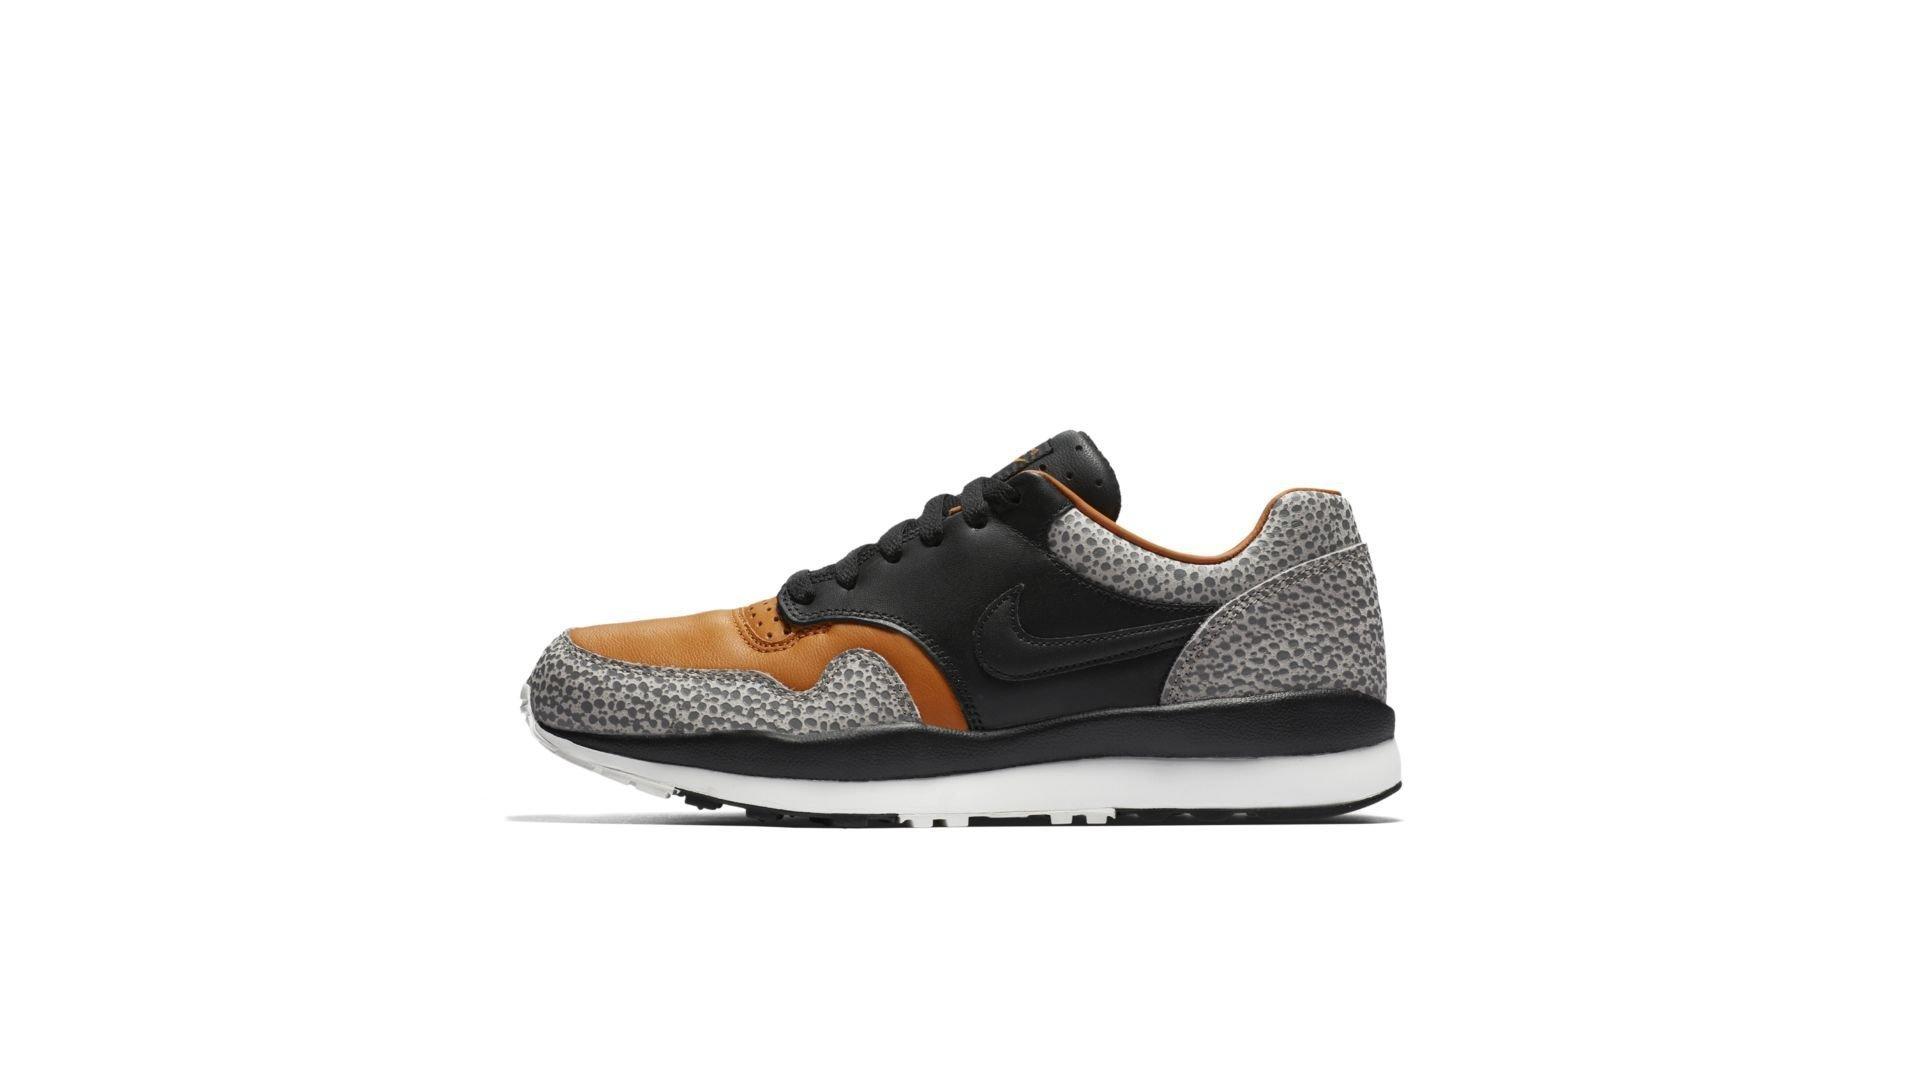 Nike Air Safari OG (2018) (AO3295-001)